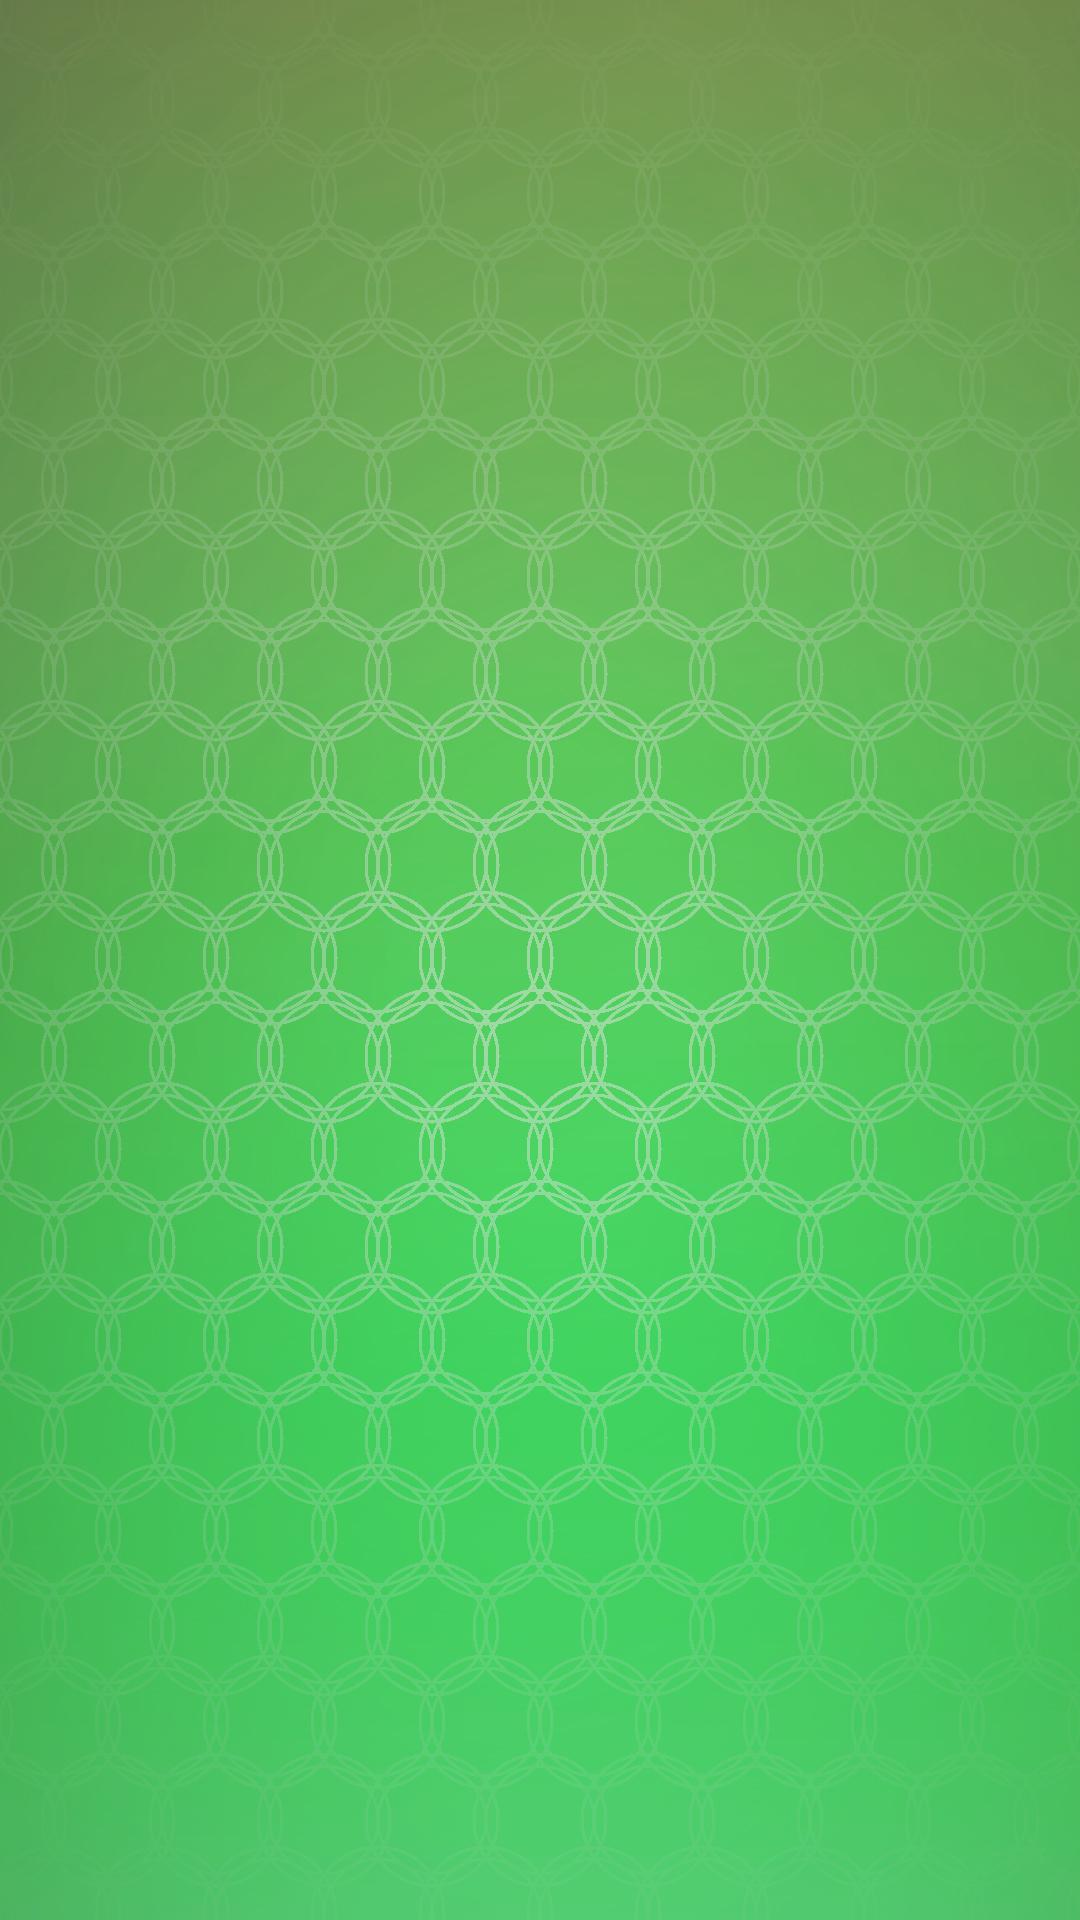 41 Green Iphone 7 Plus Wallpaper On Wallpapersafari